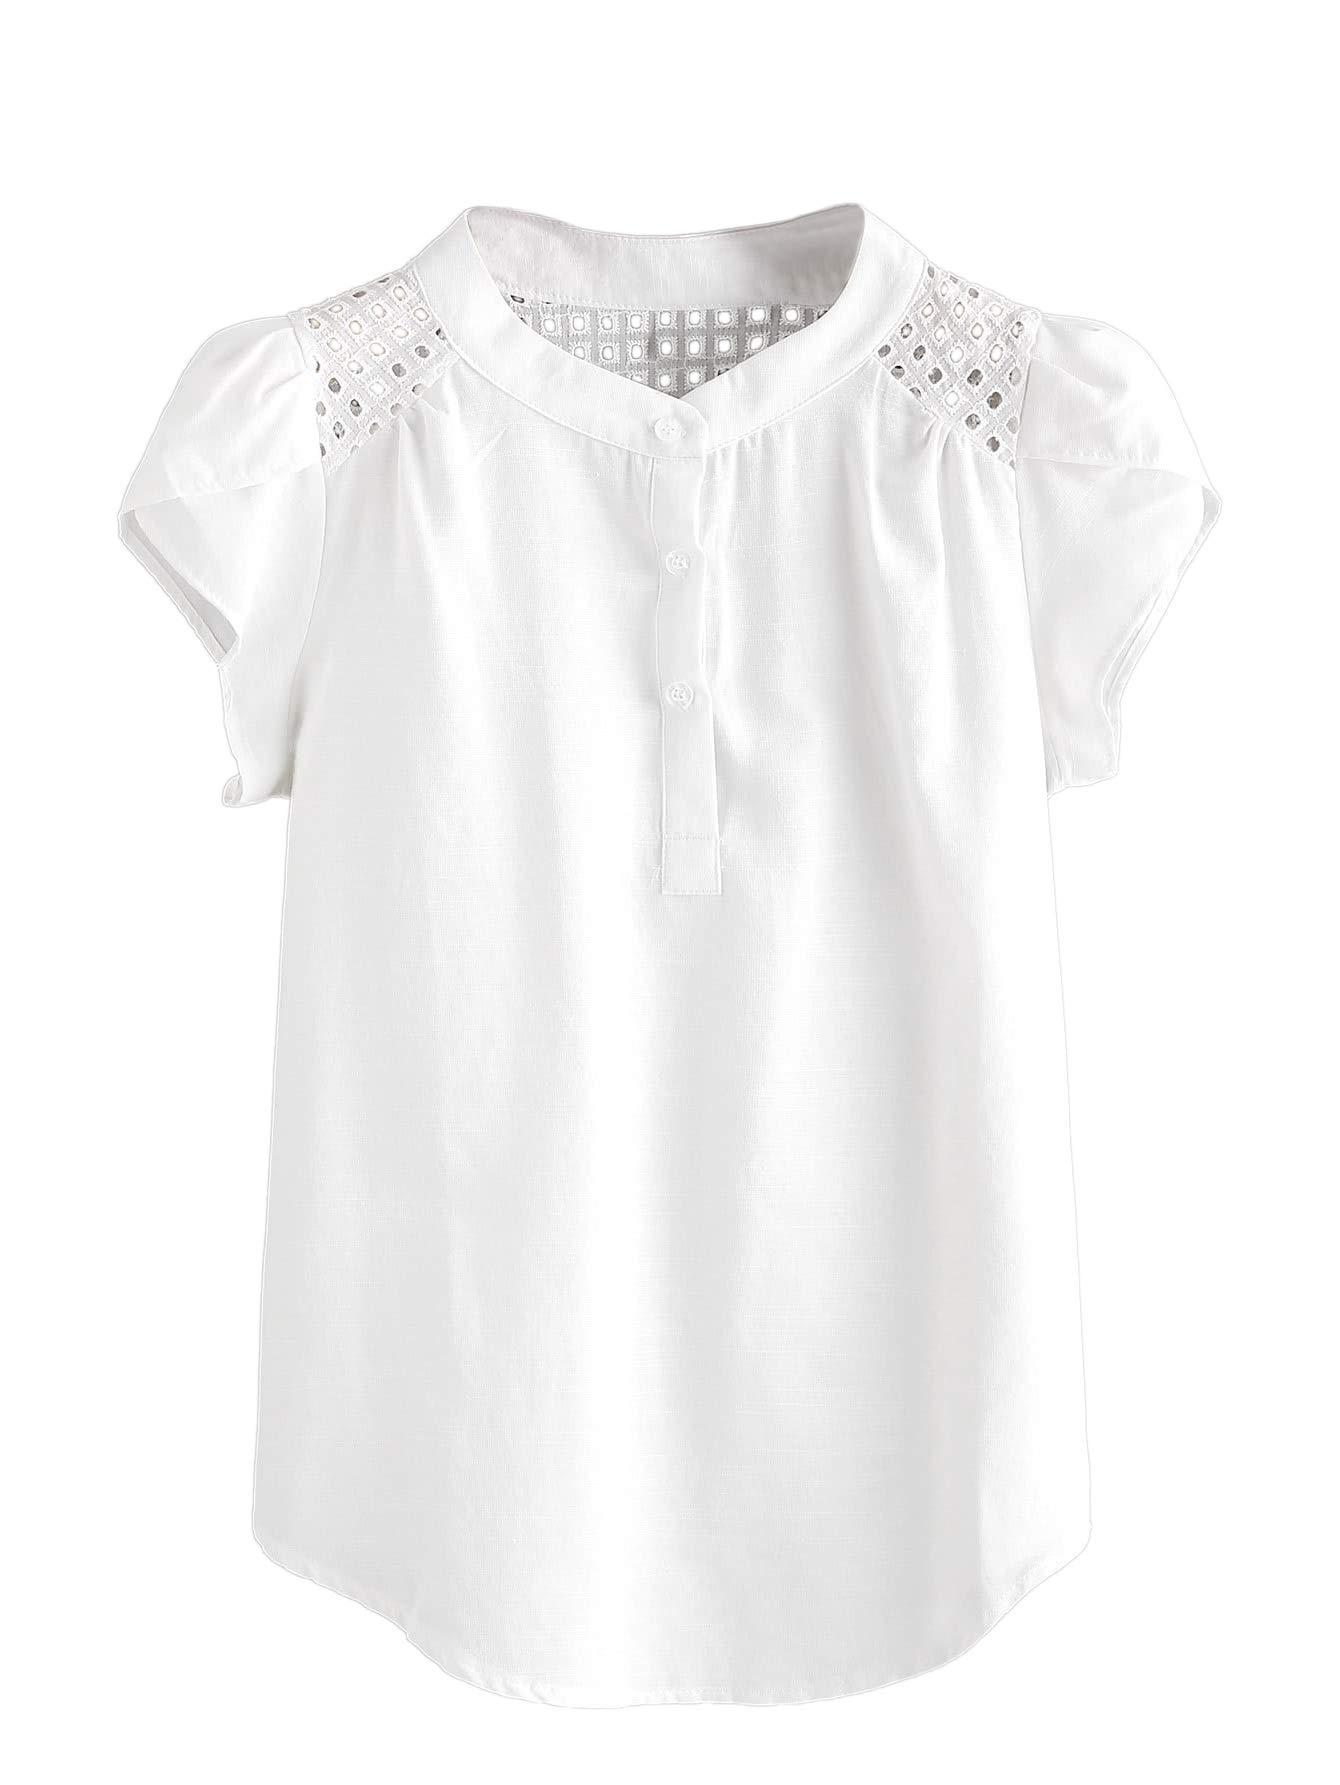 Shein 女式短袖孔眼弧形下摆纽扣工作衬衫上衣 Henley 衬衫